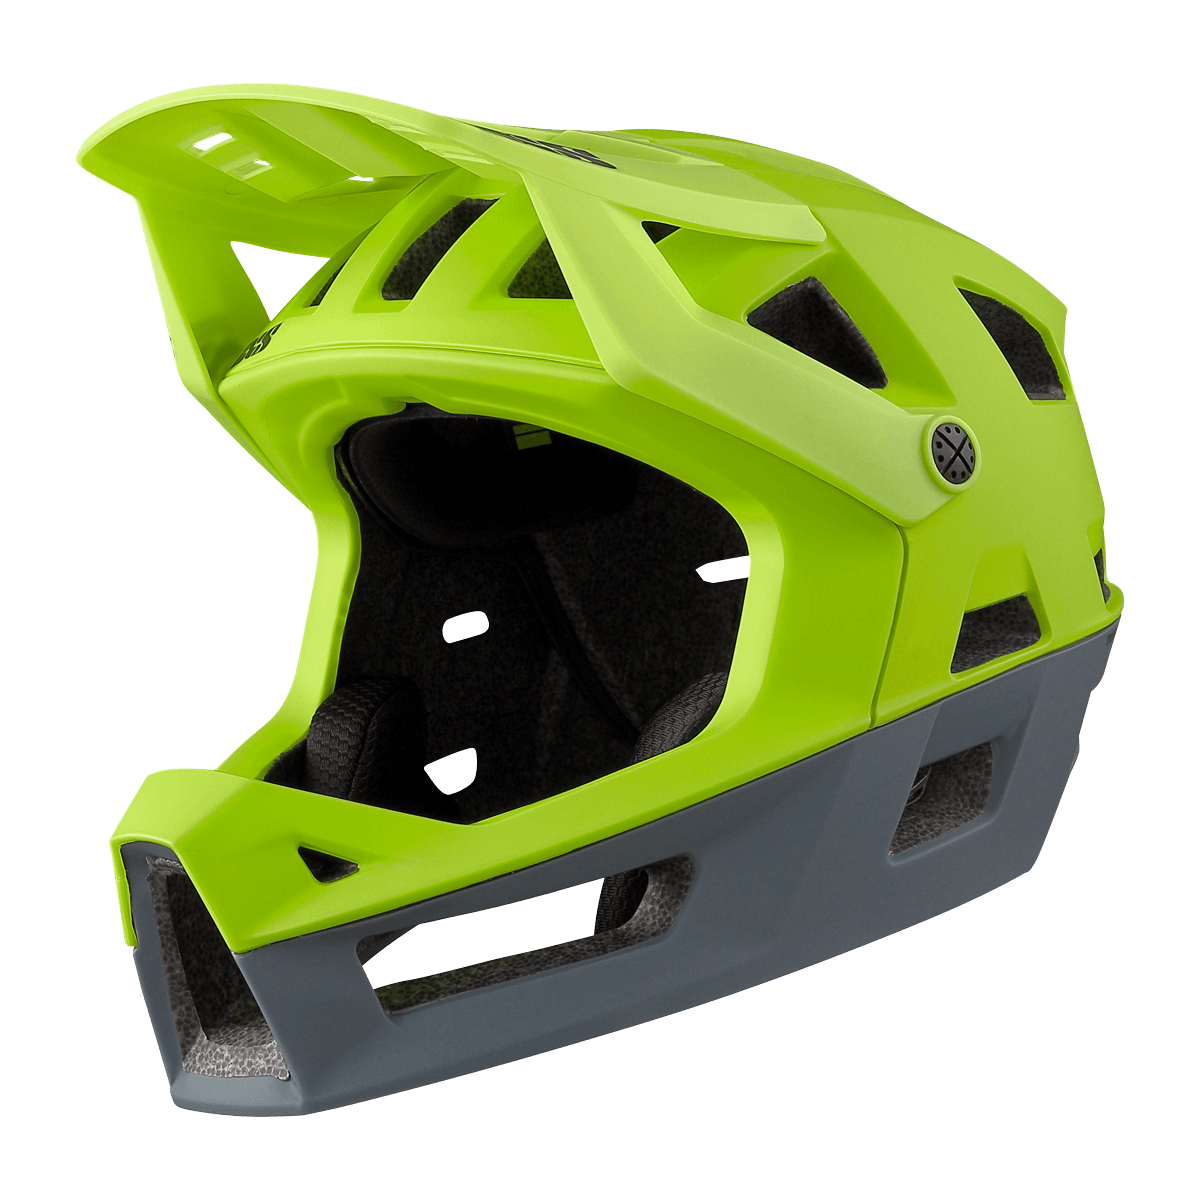 iXS integrální helma Trigger FF Lime vel. SM (54-58cm)